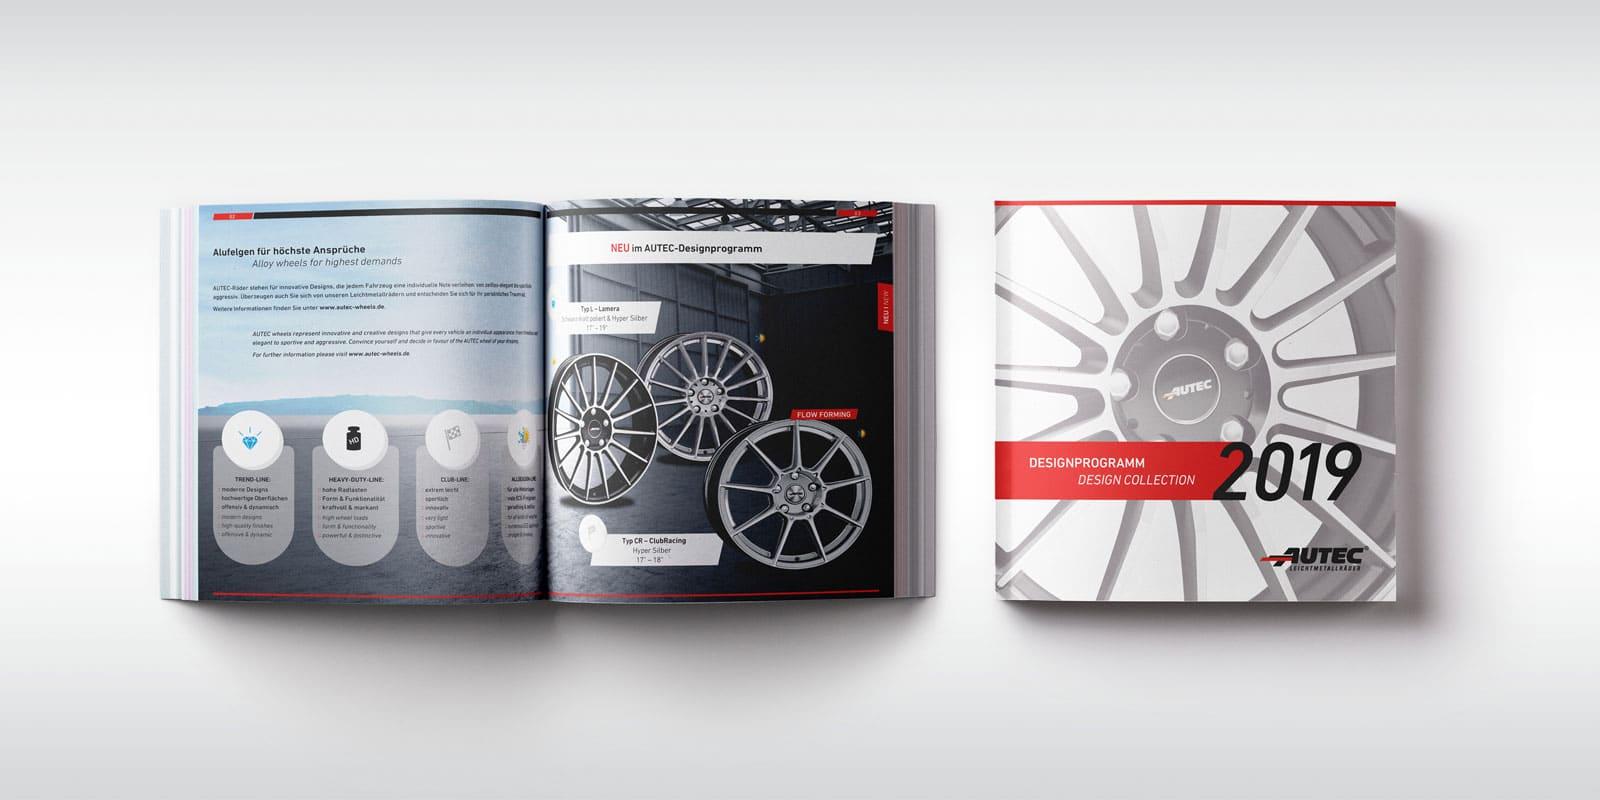 Autec – Designprogramm 2019